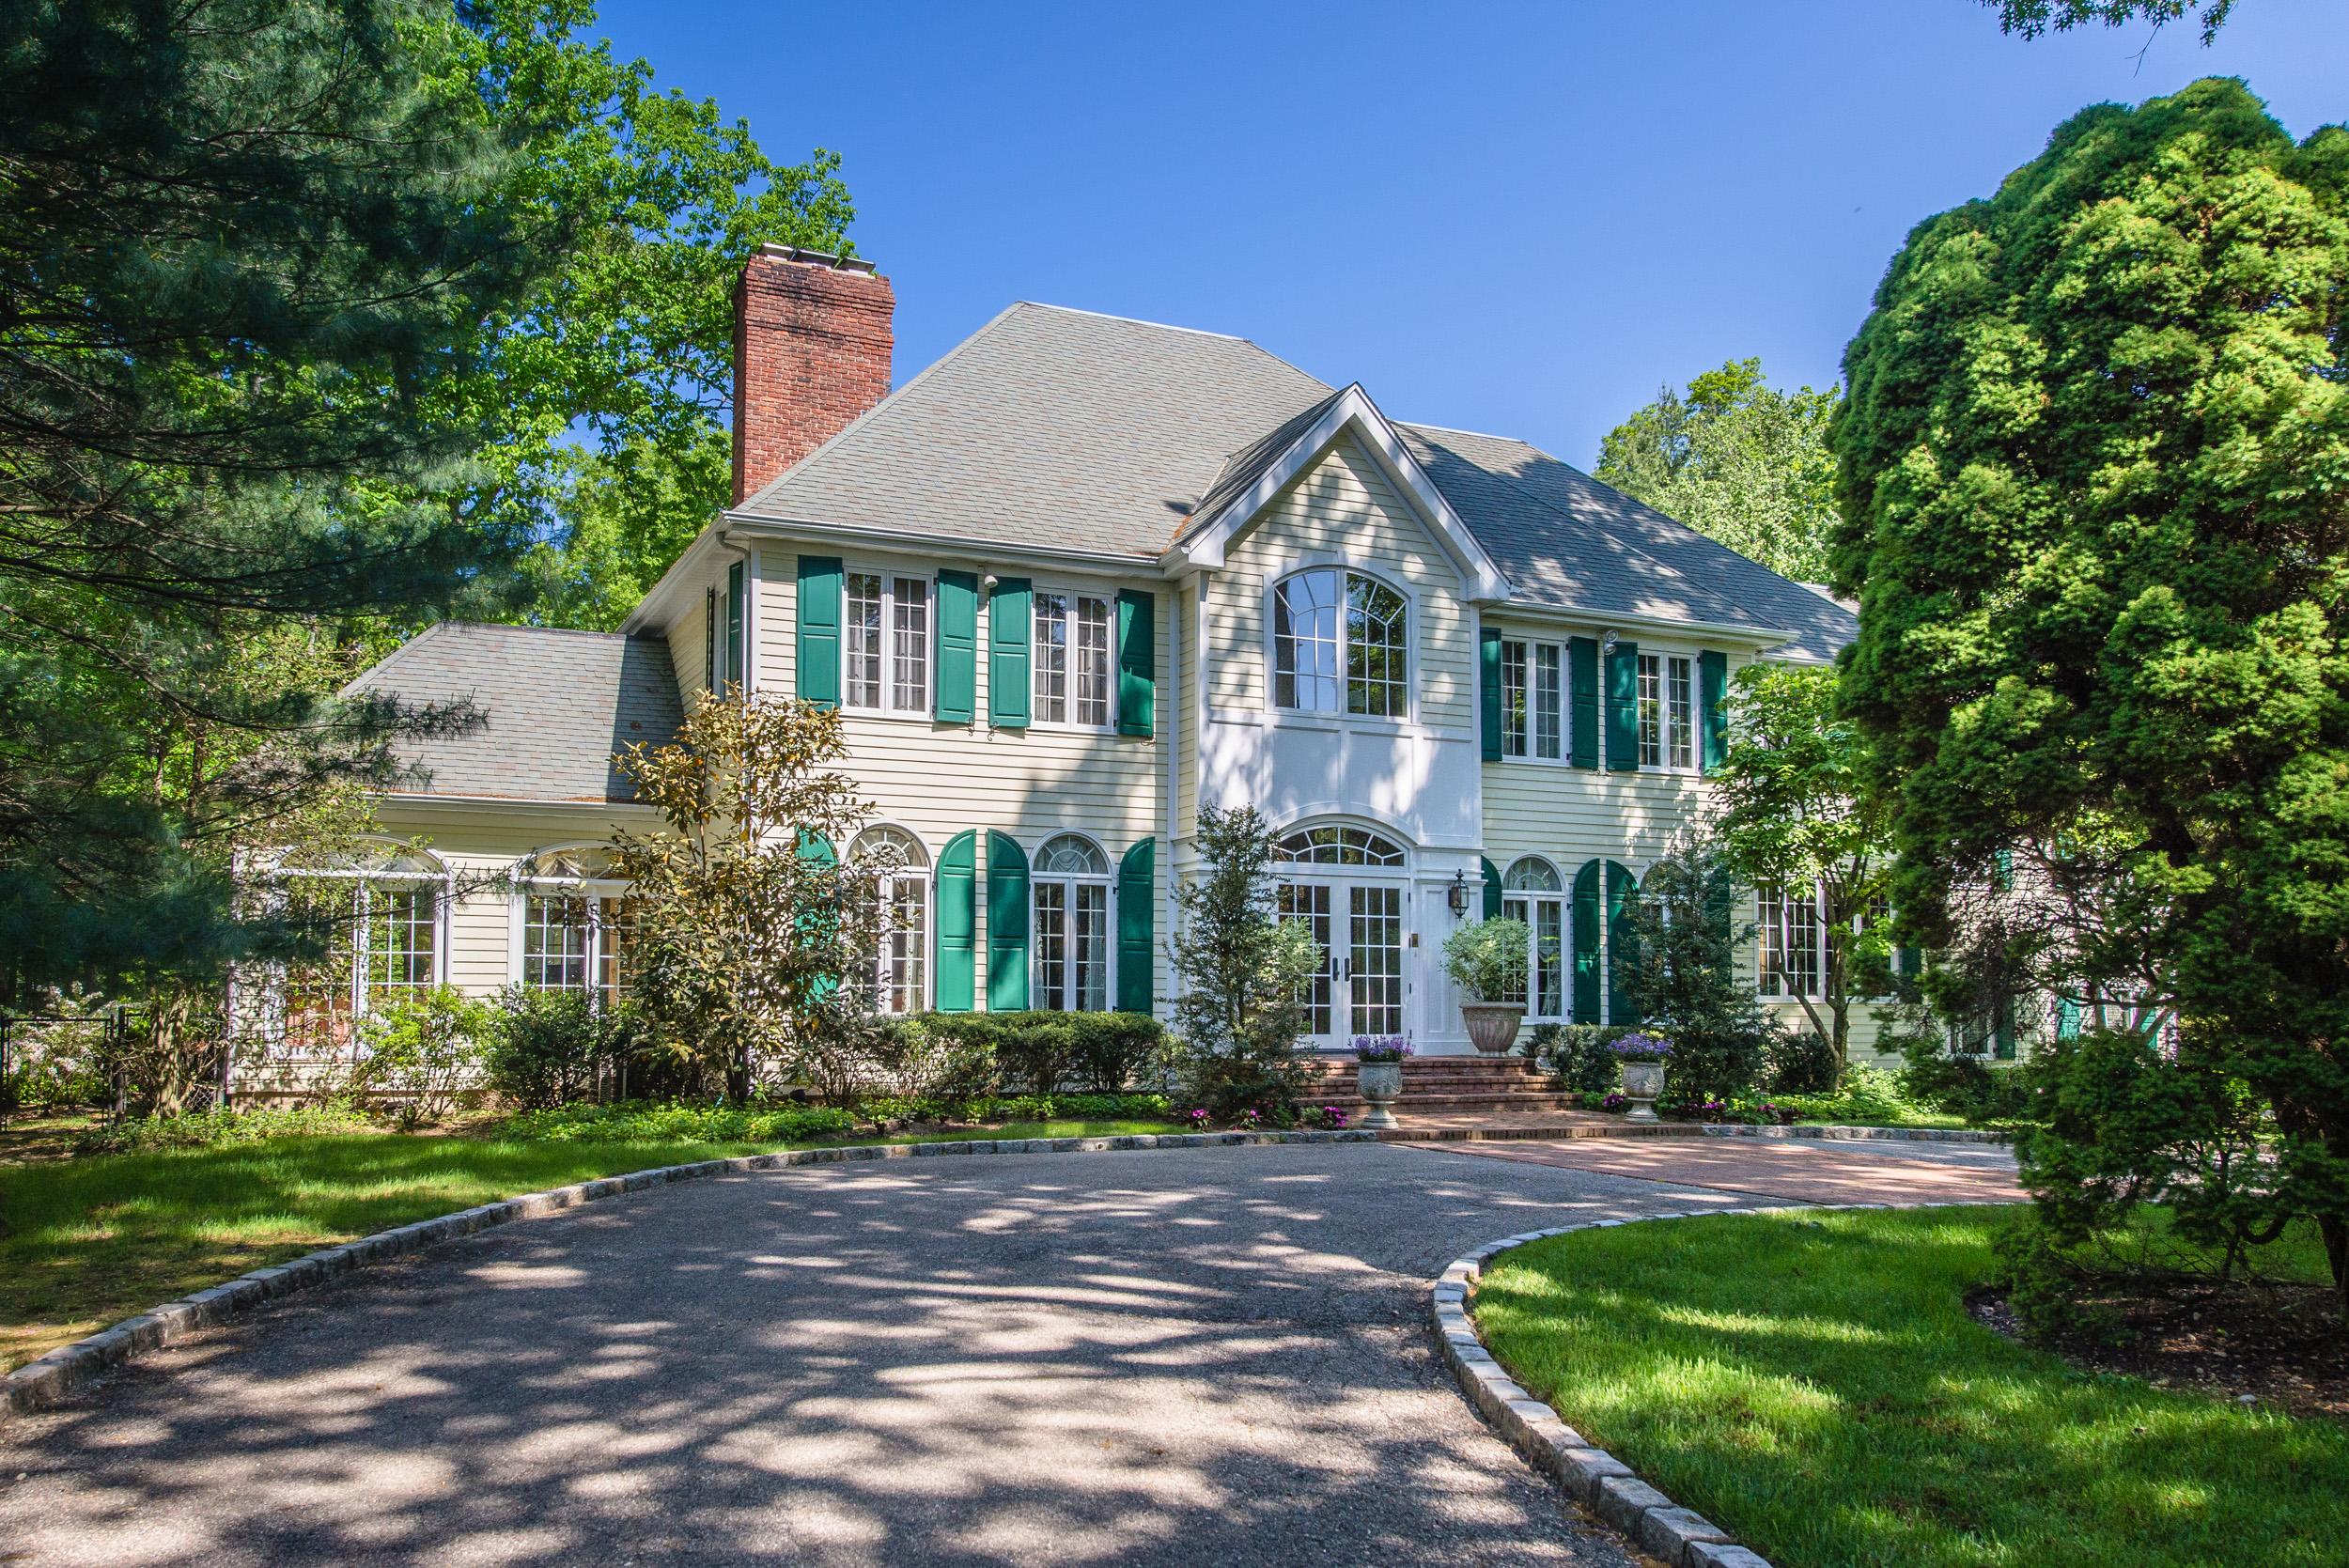 独户住宅 为 销售 在 Colonial 340 Annandale Dr Oyster Bay Cove, 纽约州 11791 美国